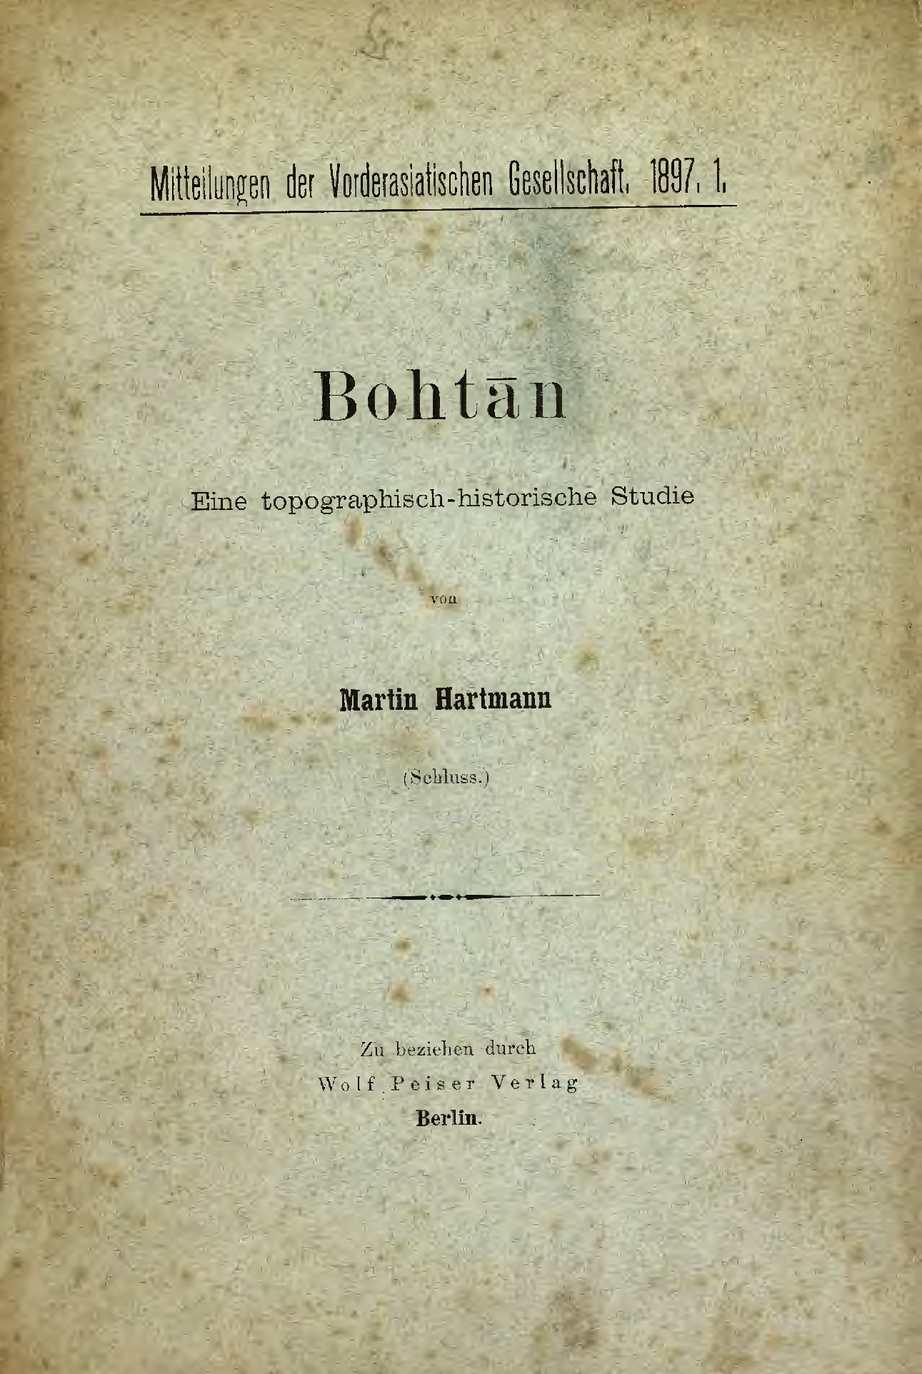 Bohtan - eine topographisch-historische studie II